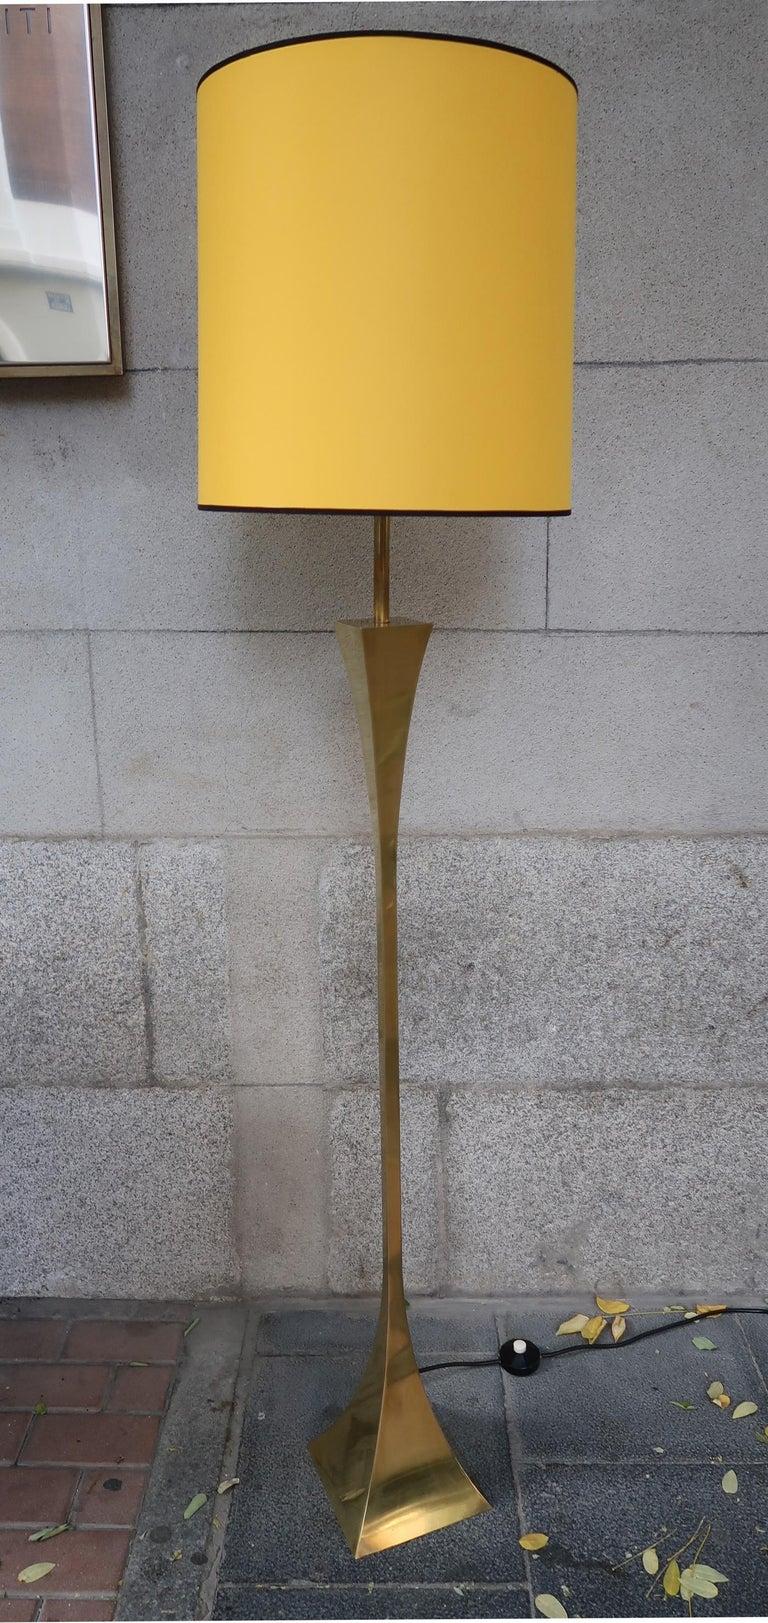 Mid-Century Modern Montagna Grillo, Mod. Pyramid, Brass Midcentury Floor Lamp, Italy, 1970 For Sale